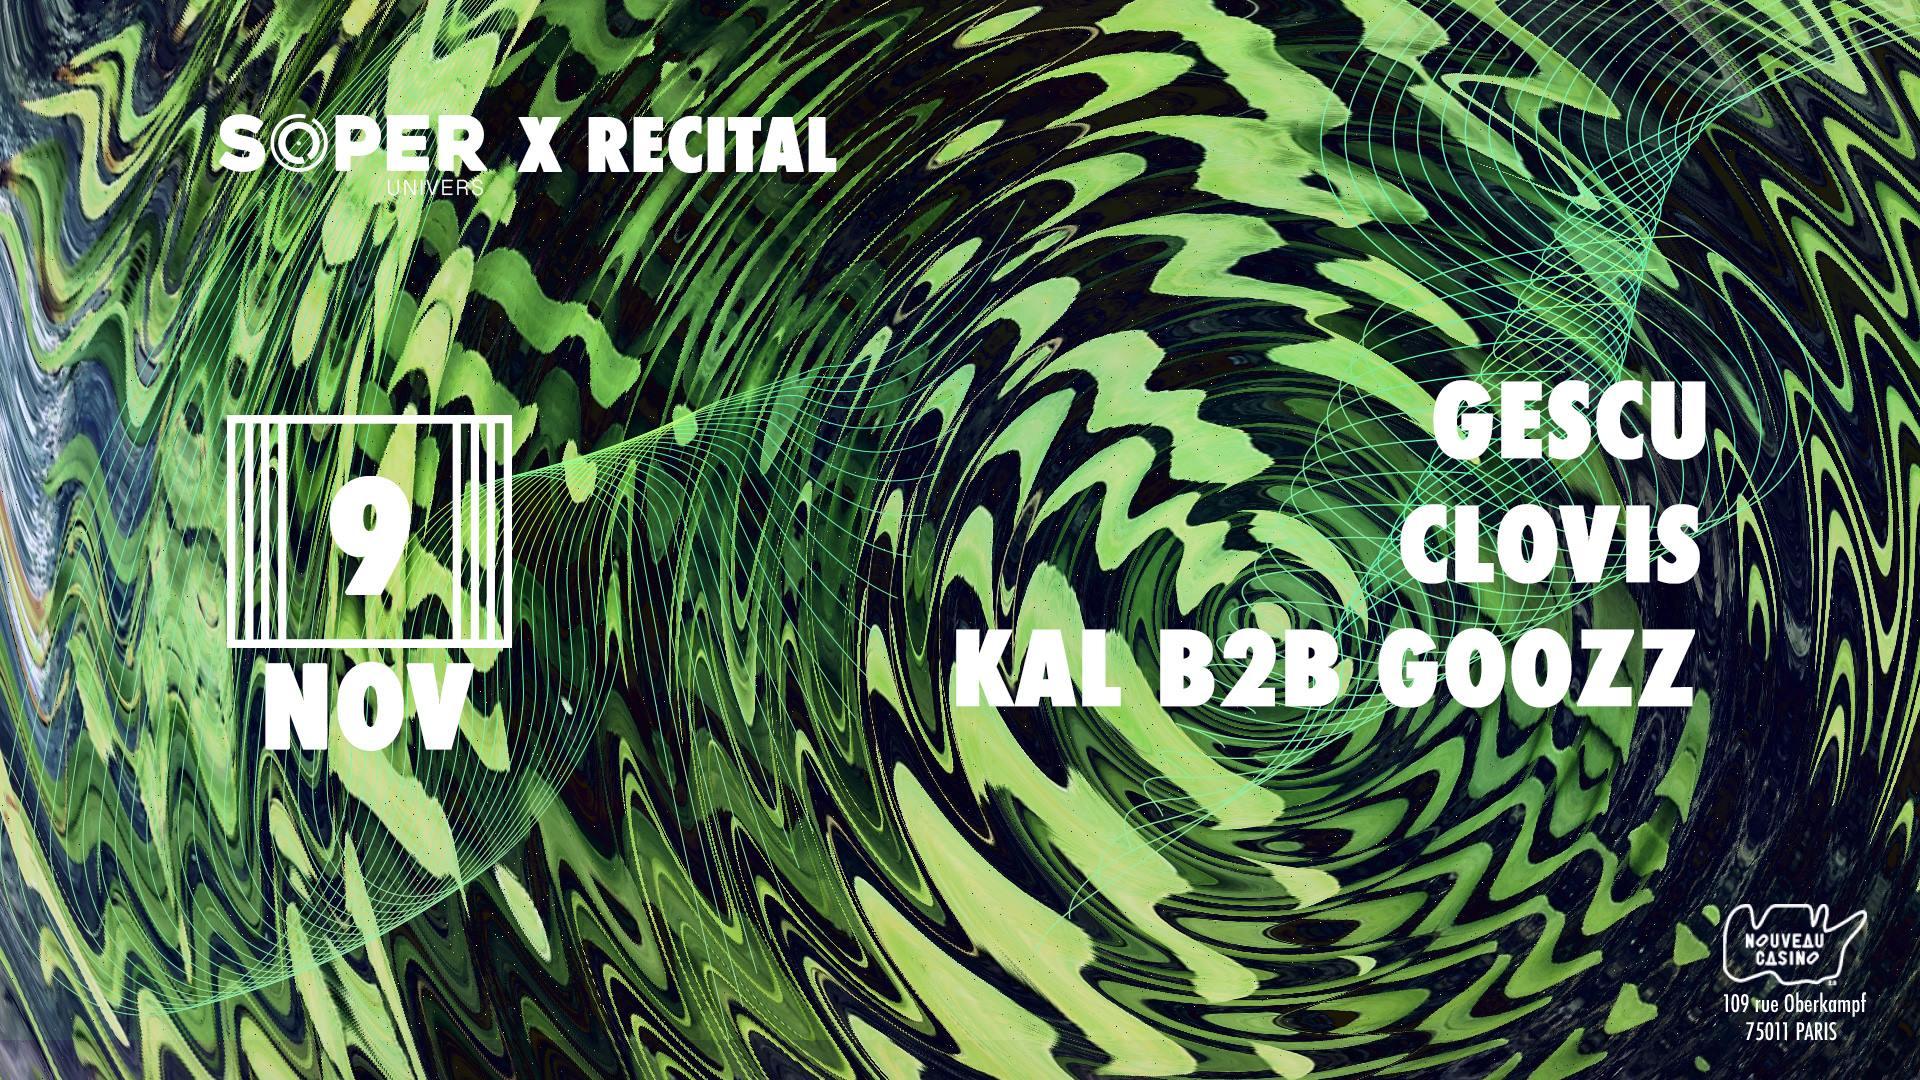 Soper Univers X Recital mission 1 : Gescu & Clovis